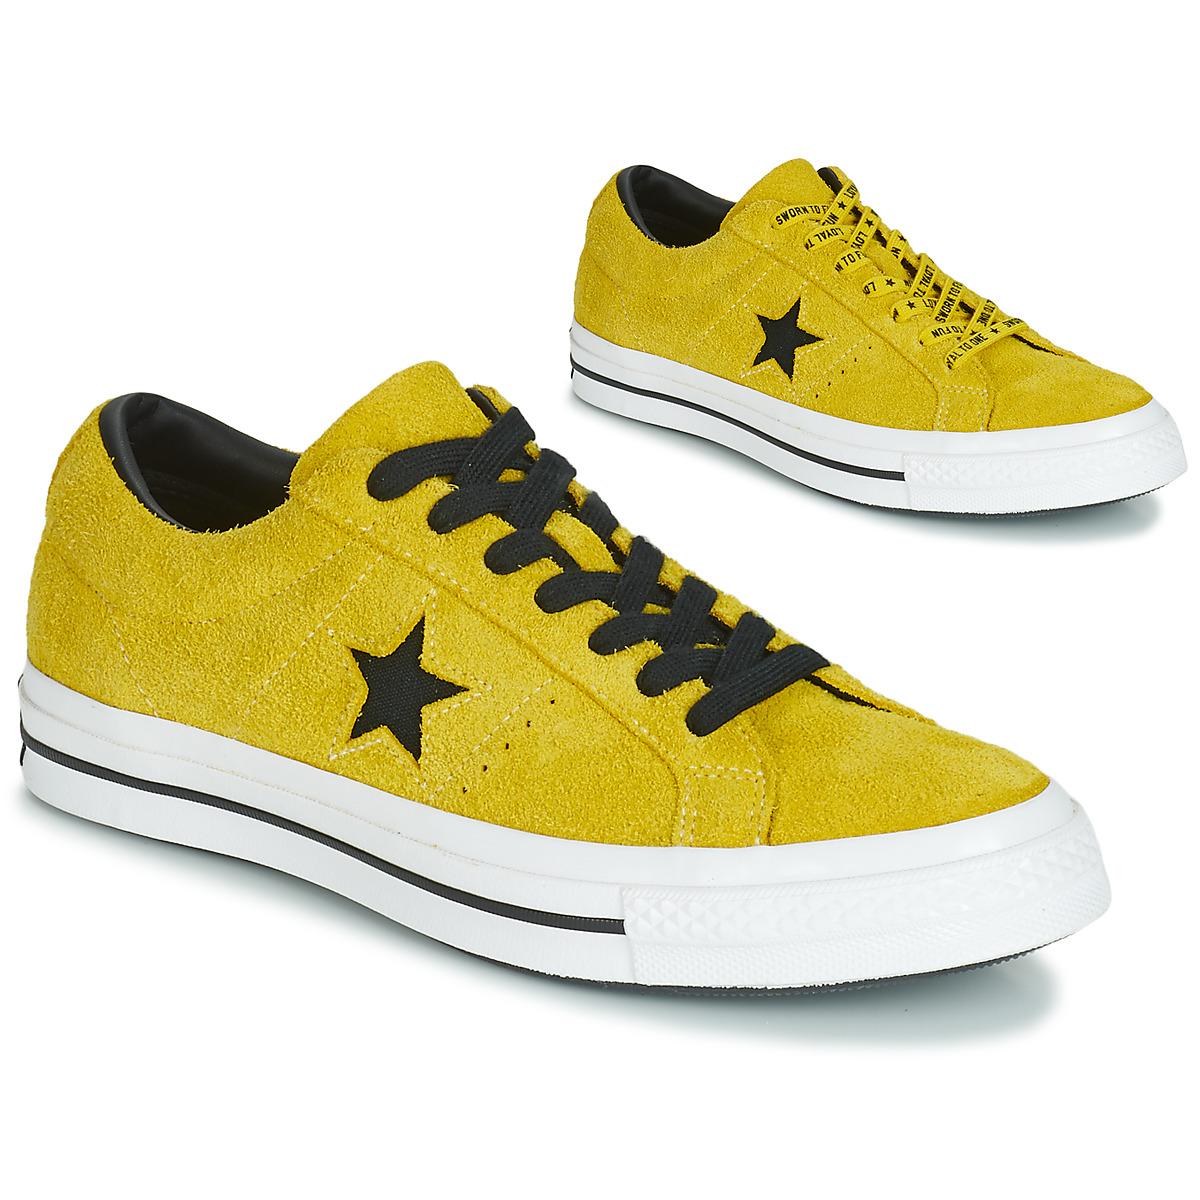 Converse Nizke superge ONE STAR DARK STAR VINTAGE SUEDE OX Rumena -  Ceneje.si 56a9247c57e